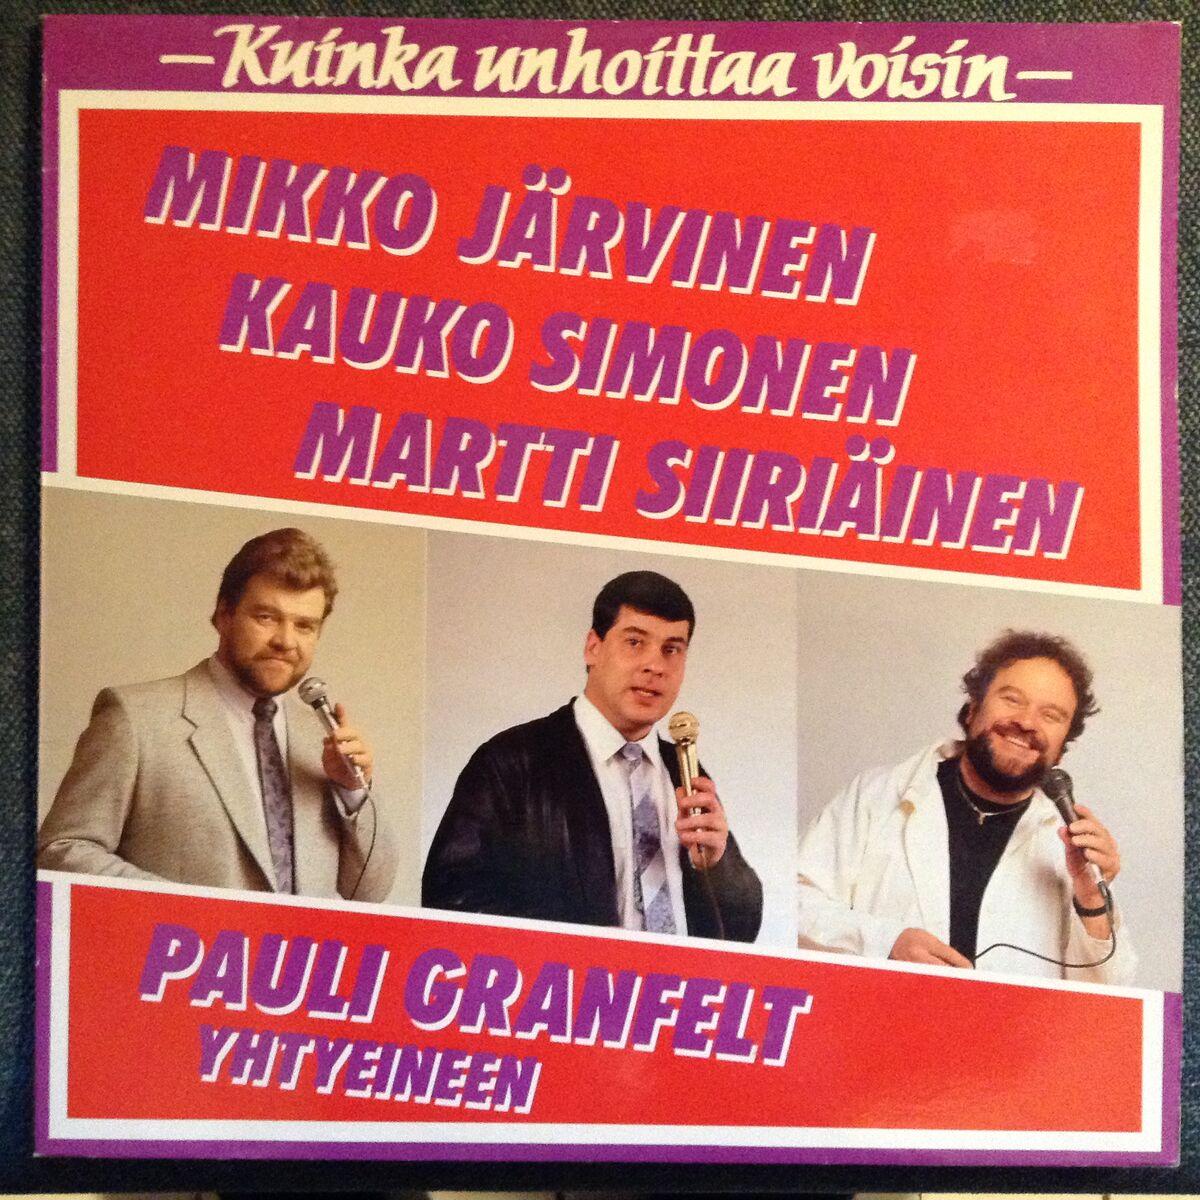 Pauli Granfelt